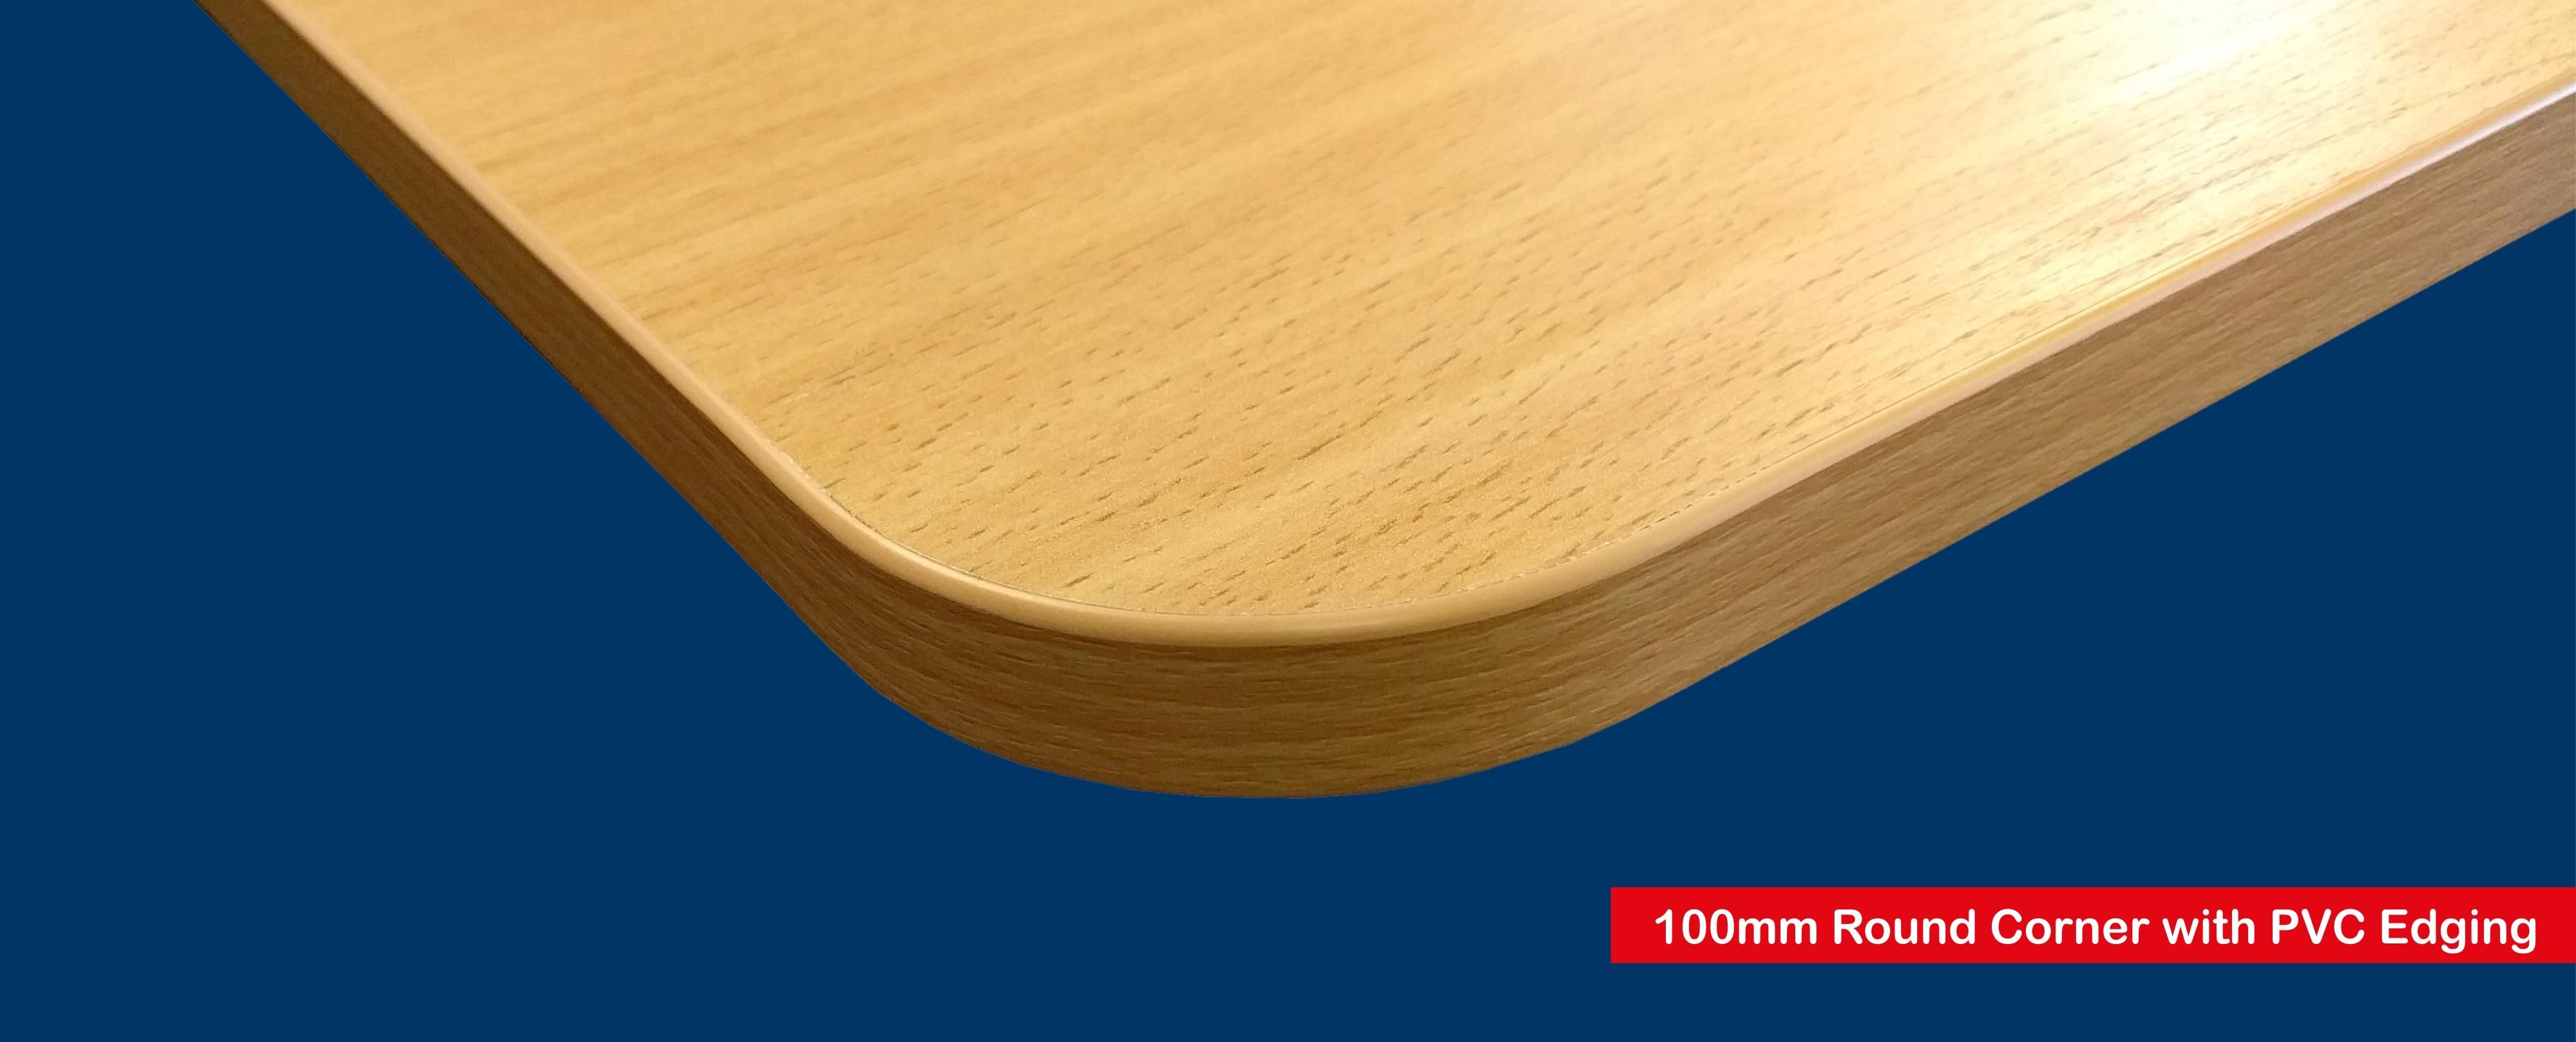 Cherry Wood Shelf Floating Slatwall Shelf 600mm Wide X